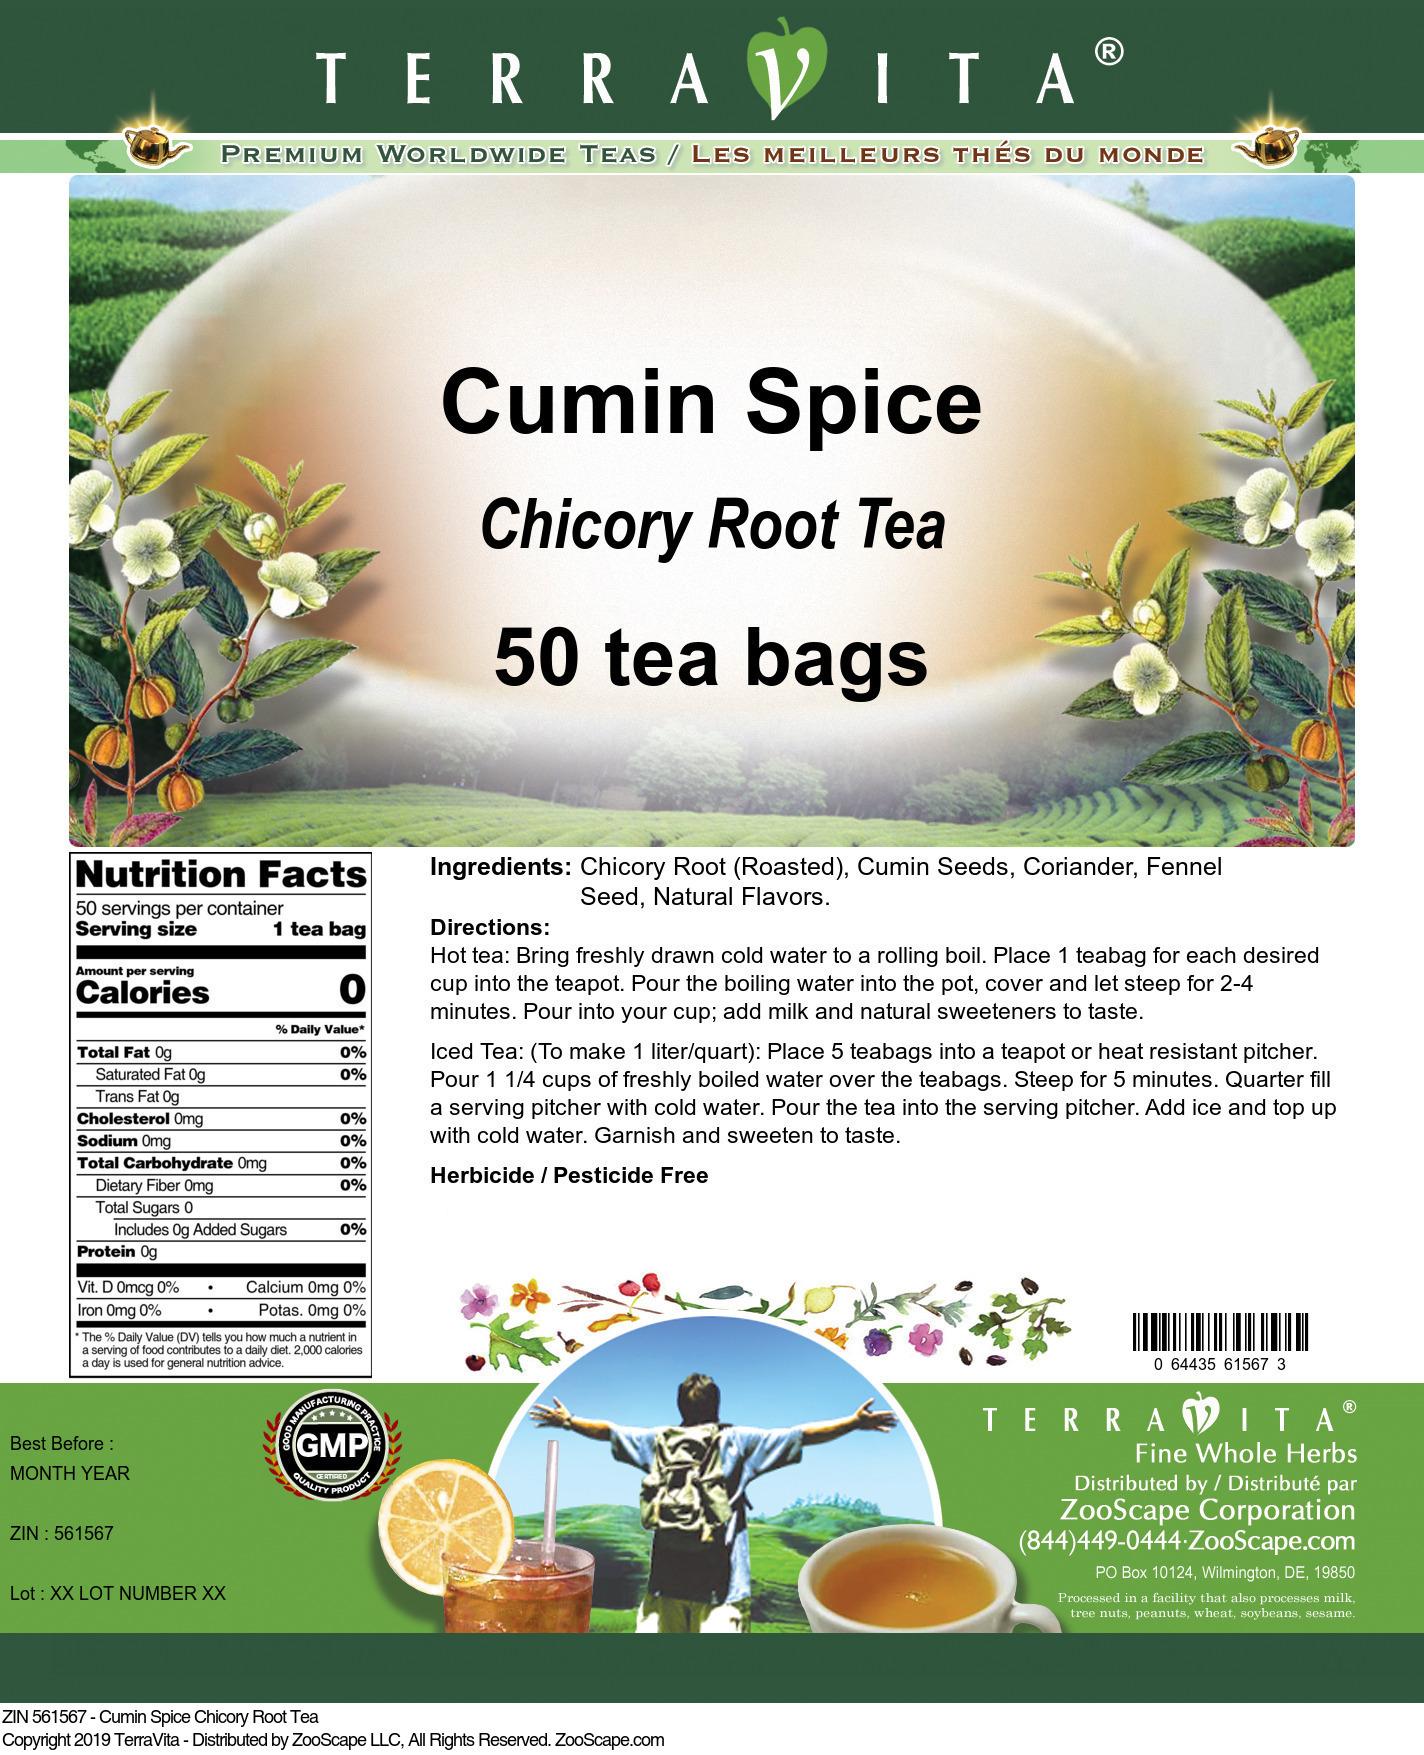 Cumin Spice Chicory Root